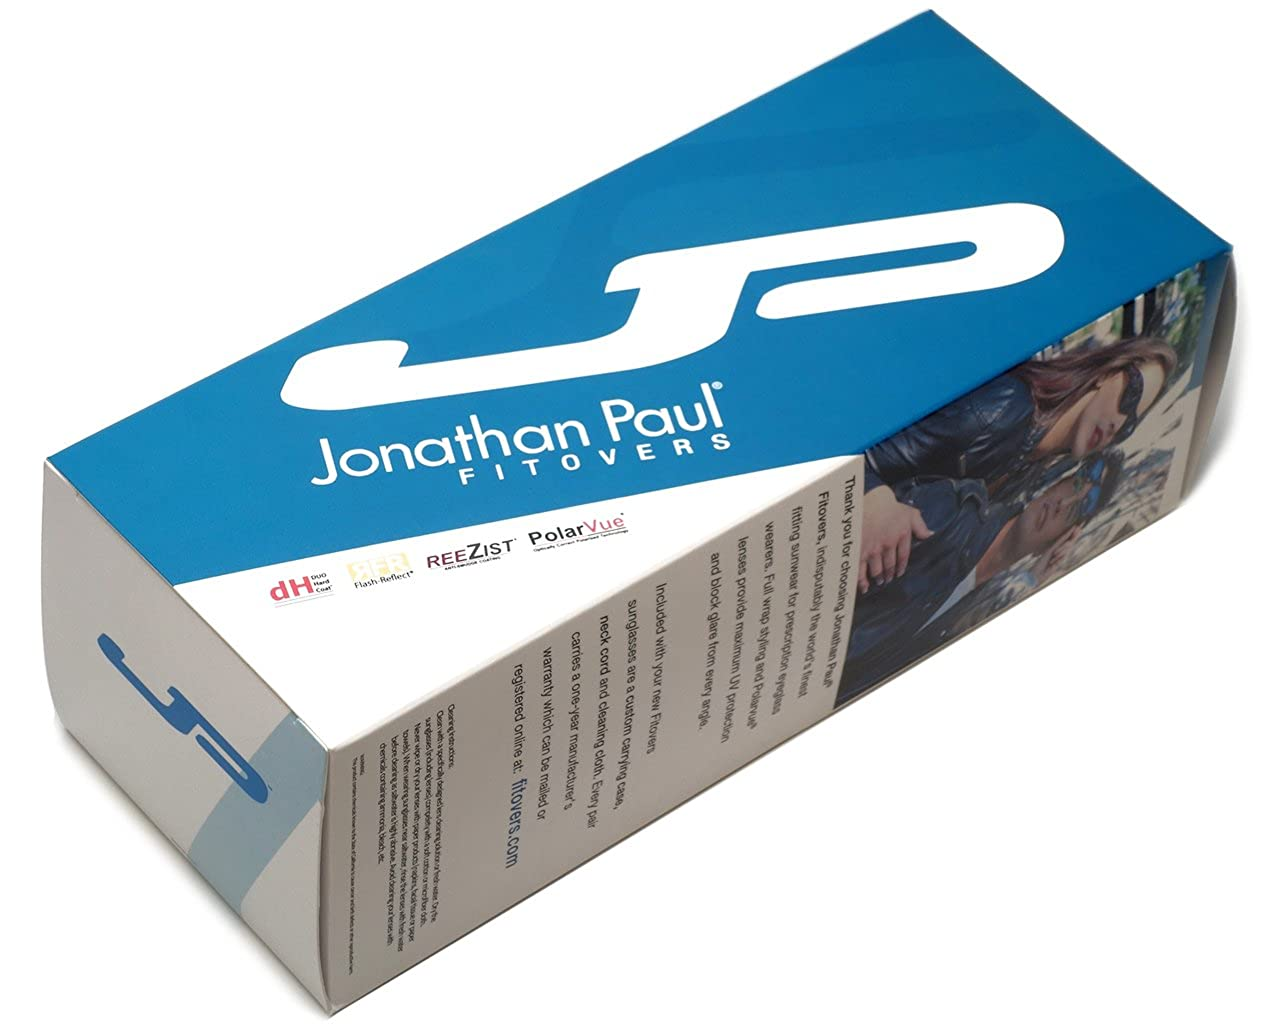 d5b2ce1c0d Amazon.com  Jonathan Paul® Fitovers Mooya Large Polarized Over Sunglasses    Black-Wind   Polarvue Blue Mirror  Clothing